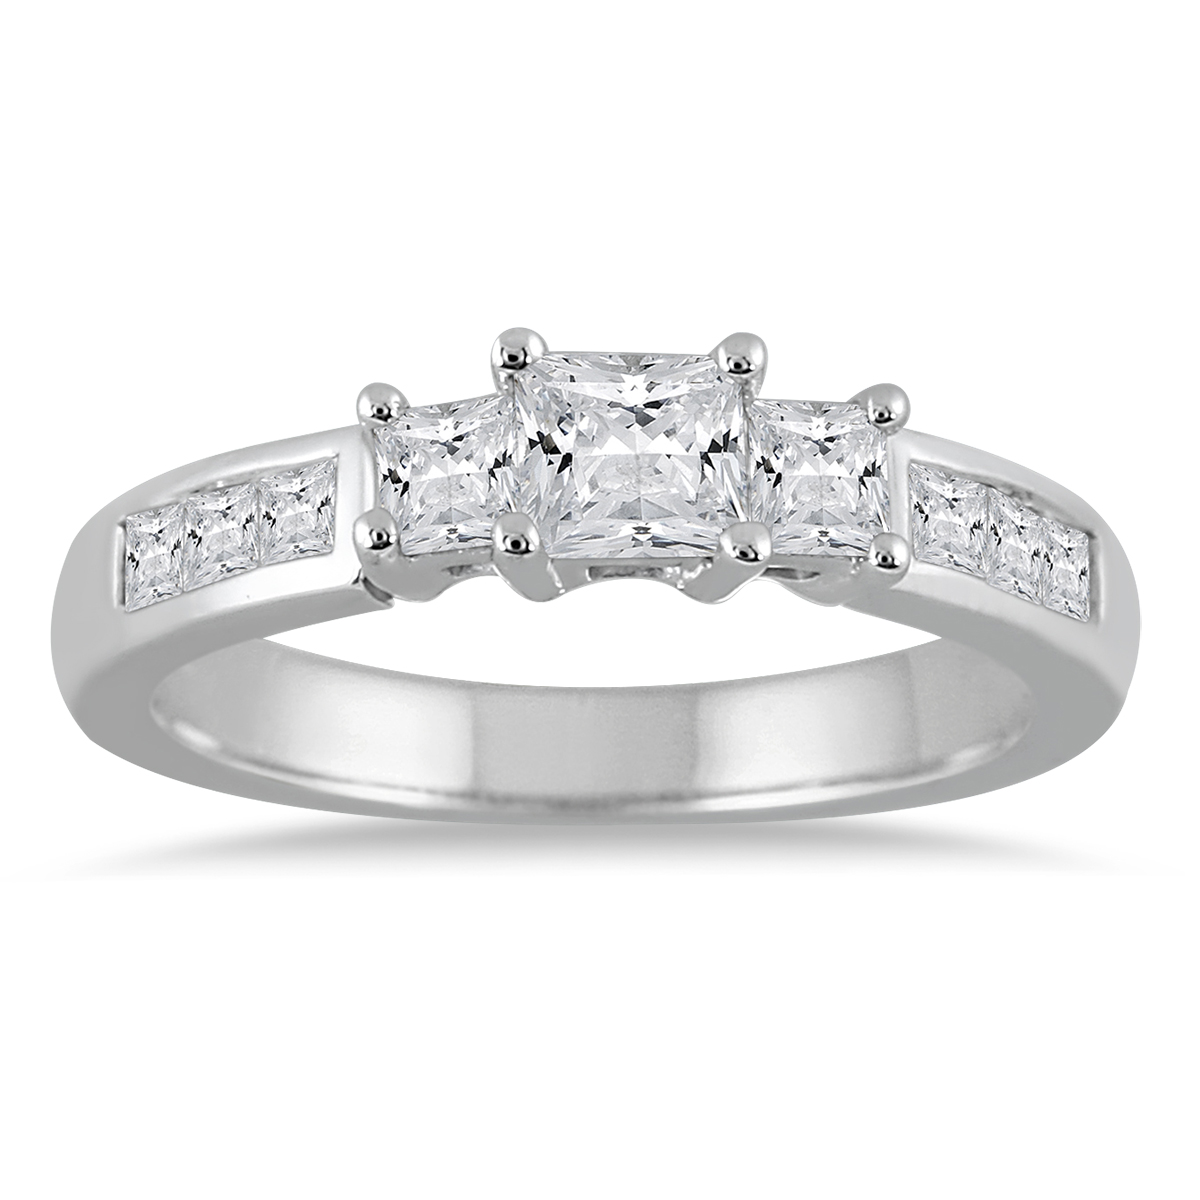 1 Carat TW Princess Cut Diamond Three